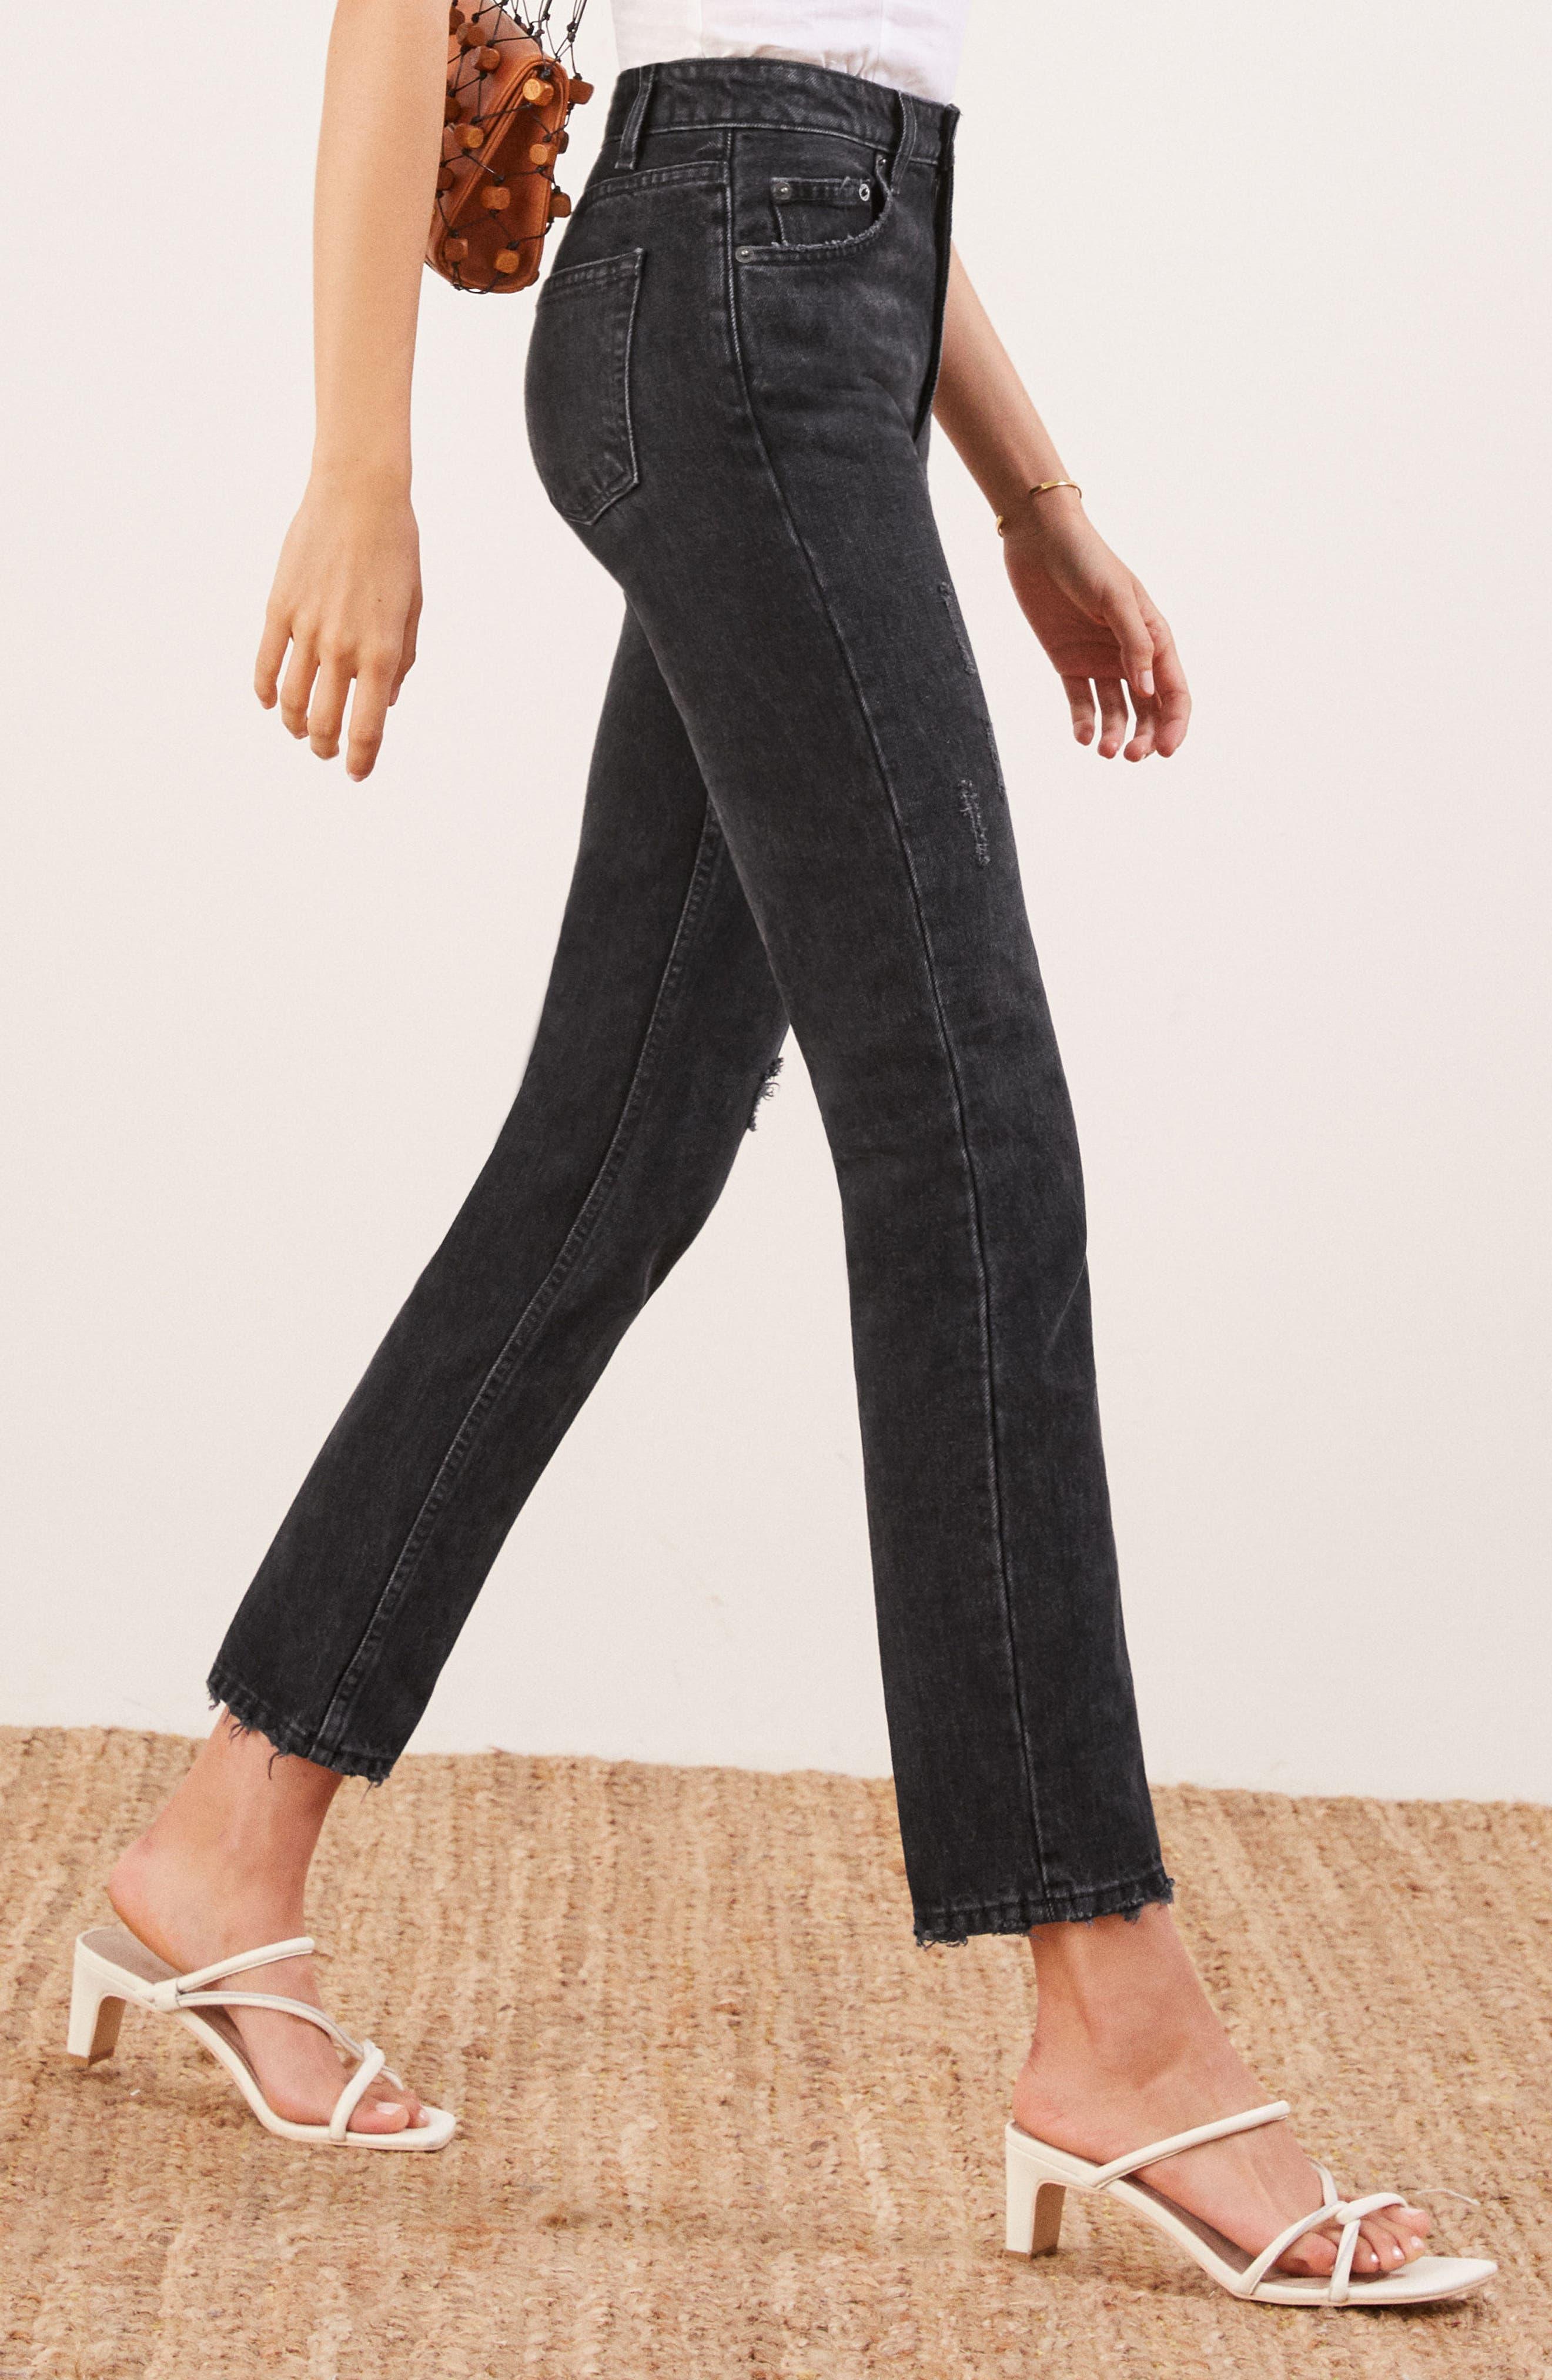 REFORMATION, Julia High Waist Cigarette Jeans, Alternate thumbnail 3, color, BLACK